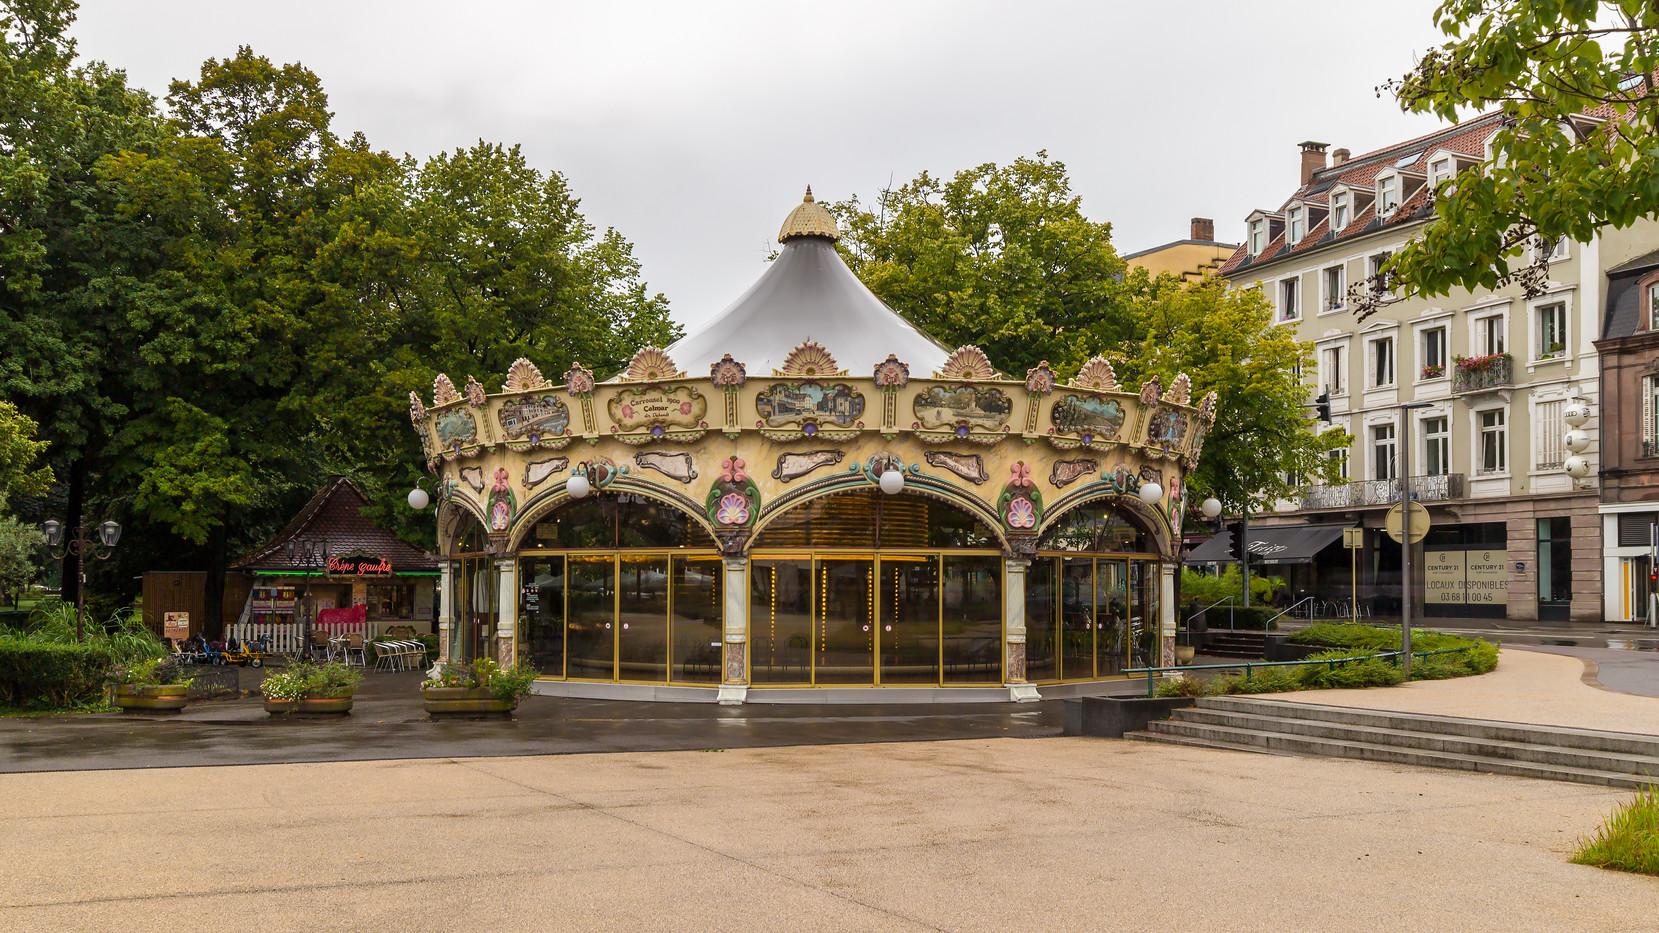 Le Caroussel de Colmar